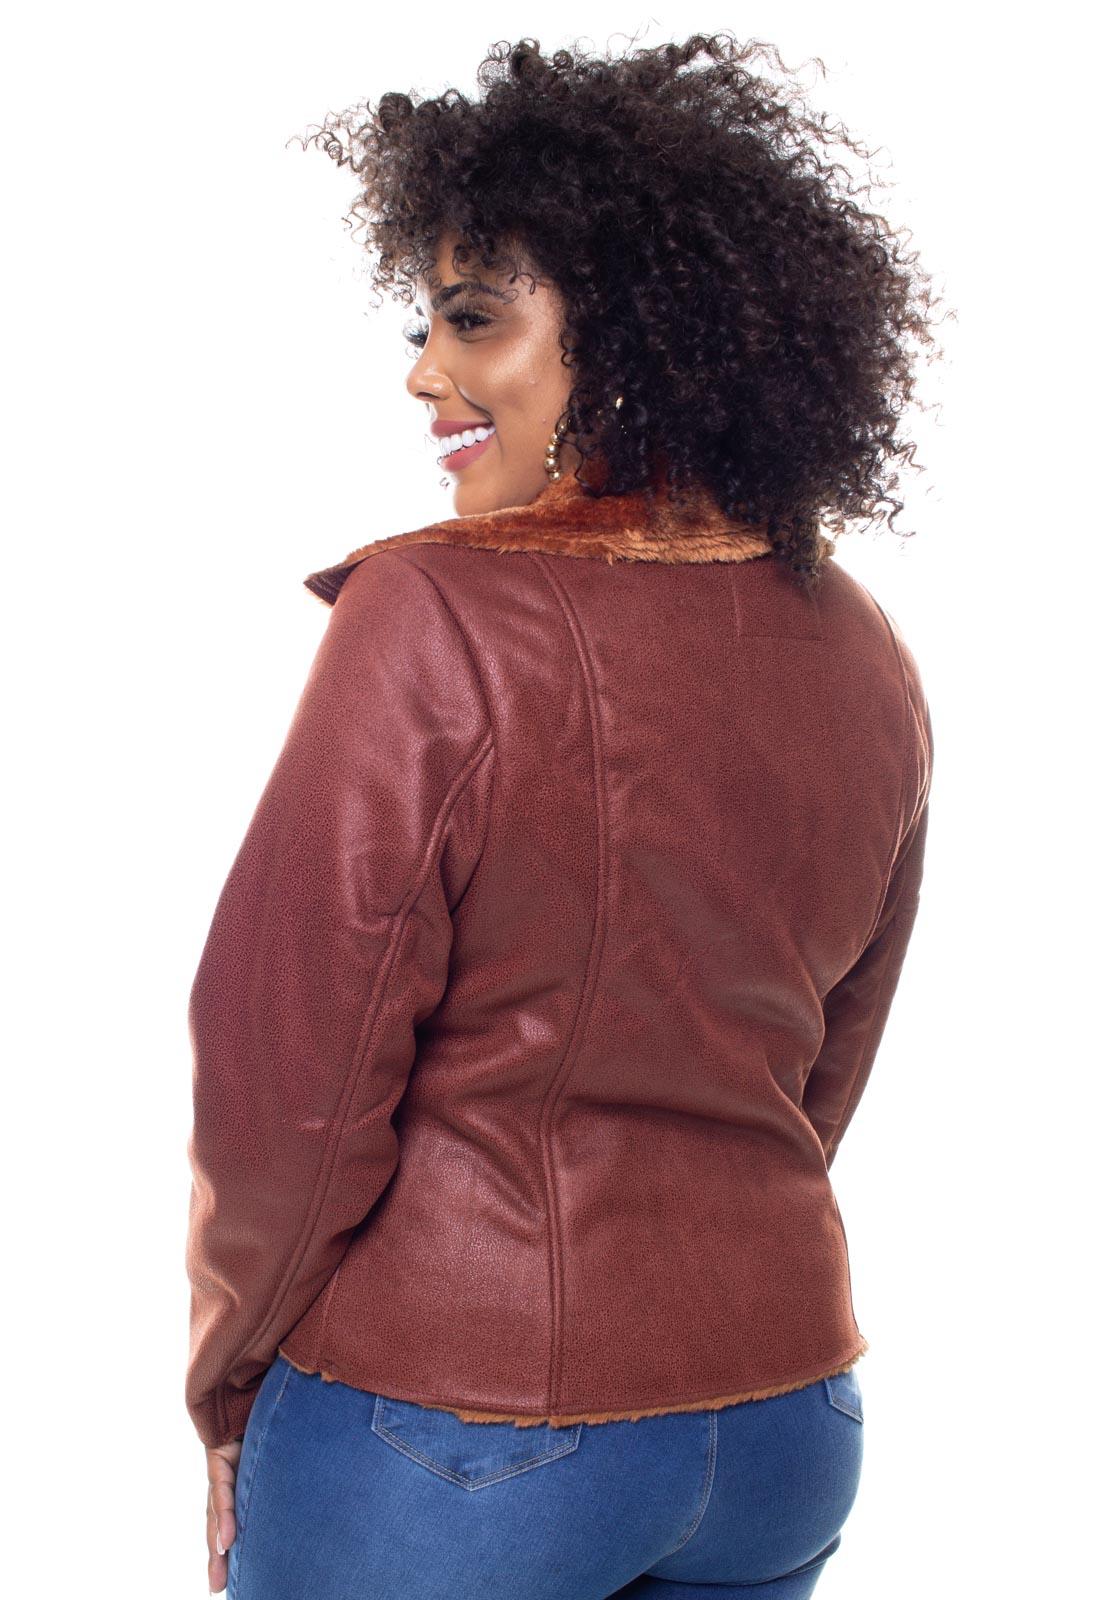 Jaqueta Feminina Oversize Crocker - 45057  - CROCKER JEANS